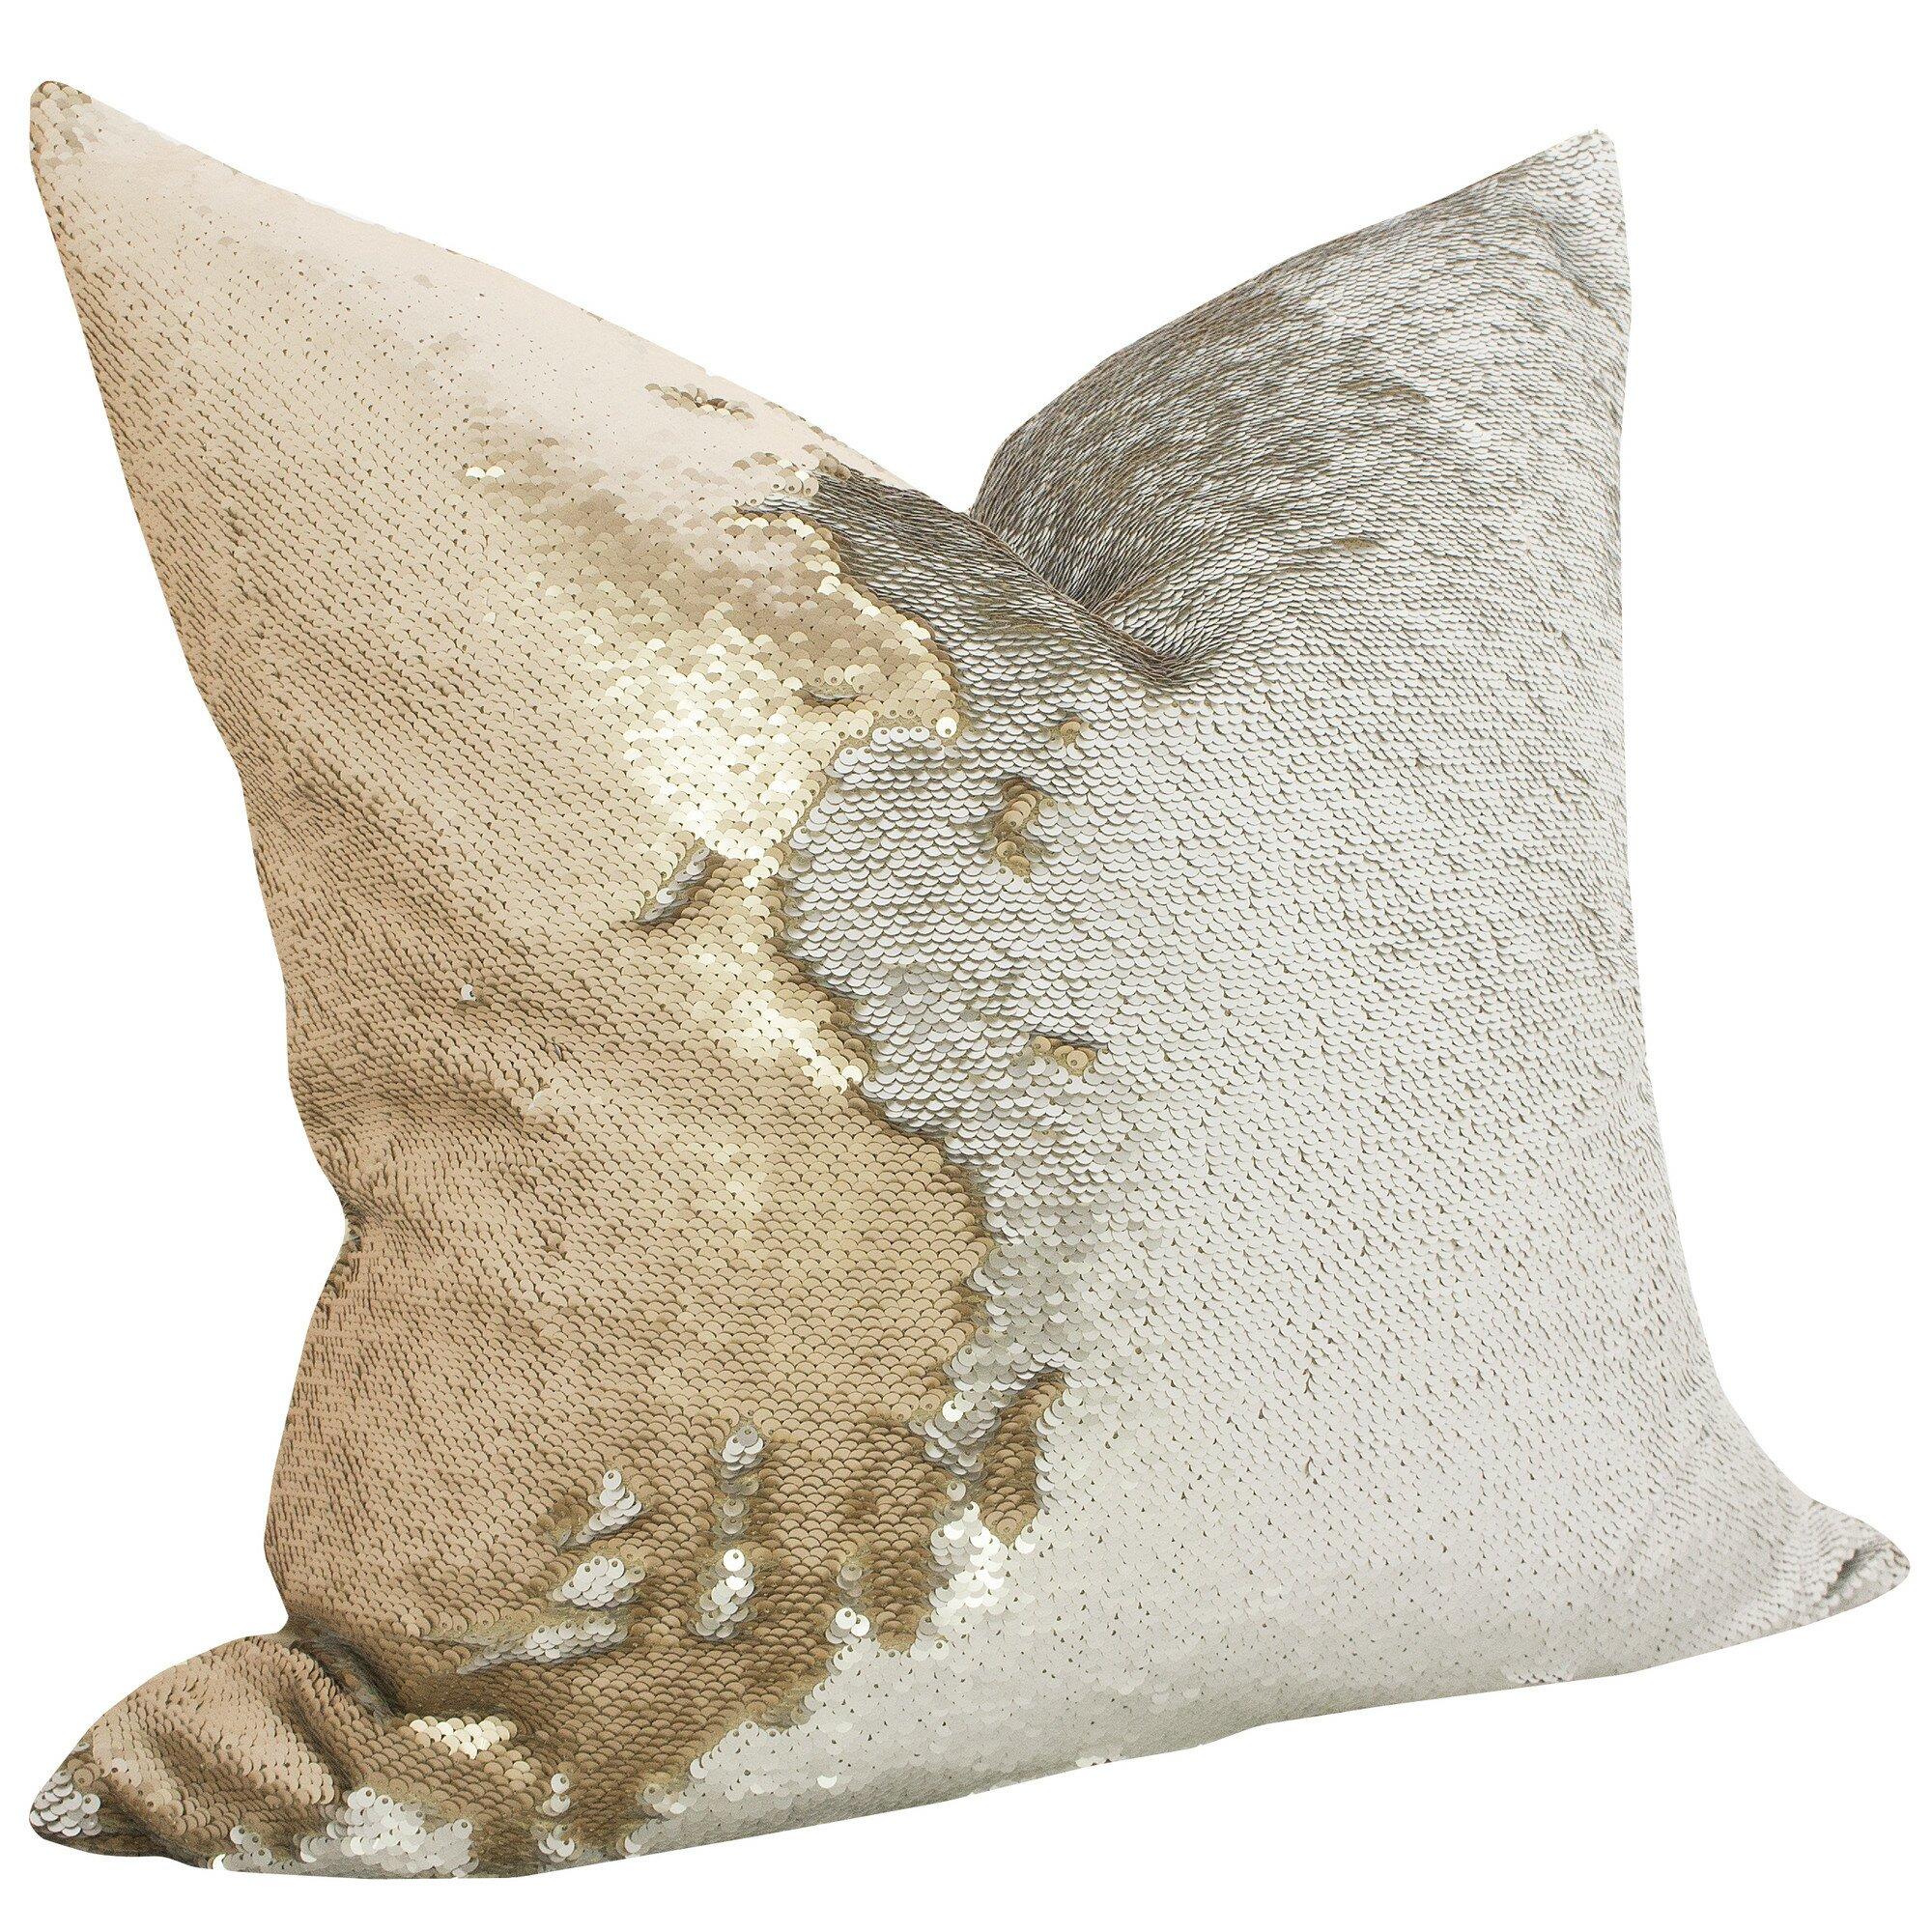 Mermaid Decorative Pillows : TheWatsonShop Mermaid Sequin Throw Pillow & Reviews Wayfair